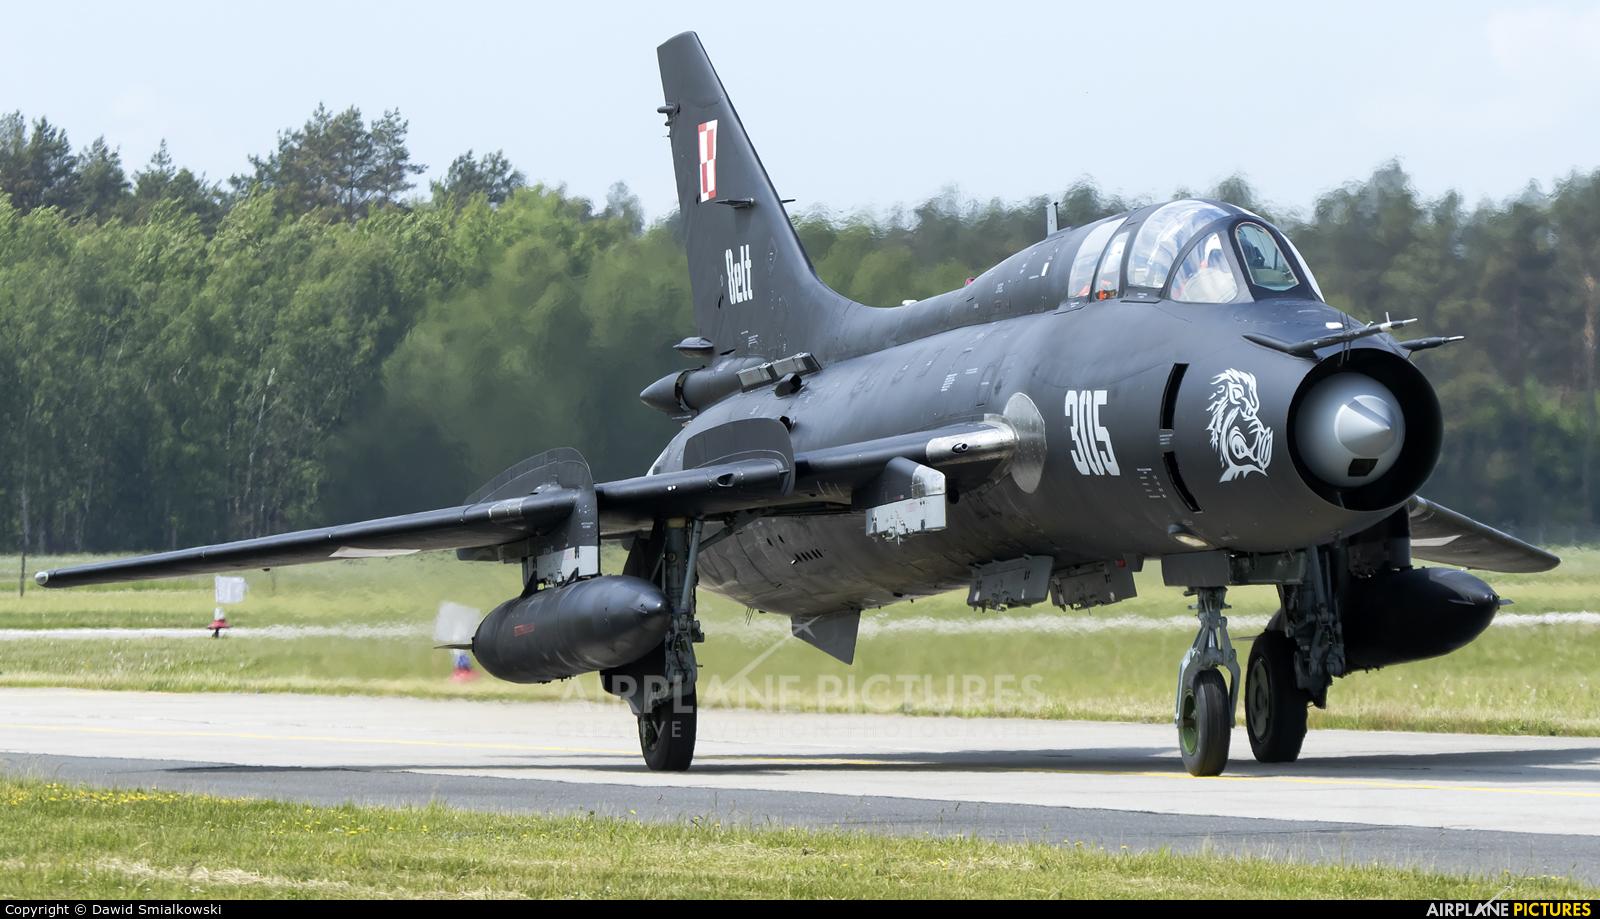 Poland - Air Force 305 aircraft at Świdwin